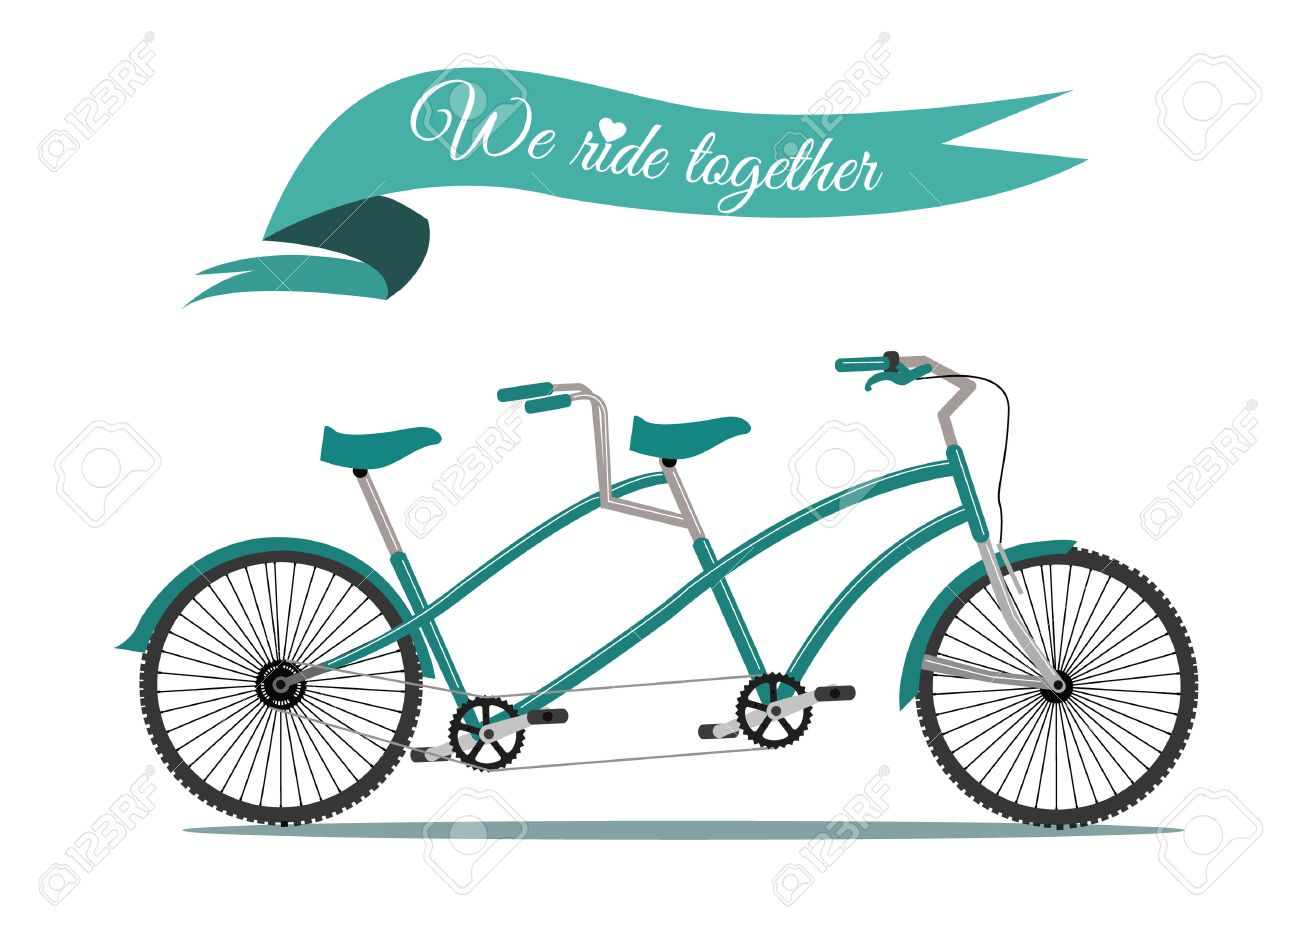 1300x949 Auto Blog Post Vintage Tandem Bicycle Drawing